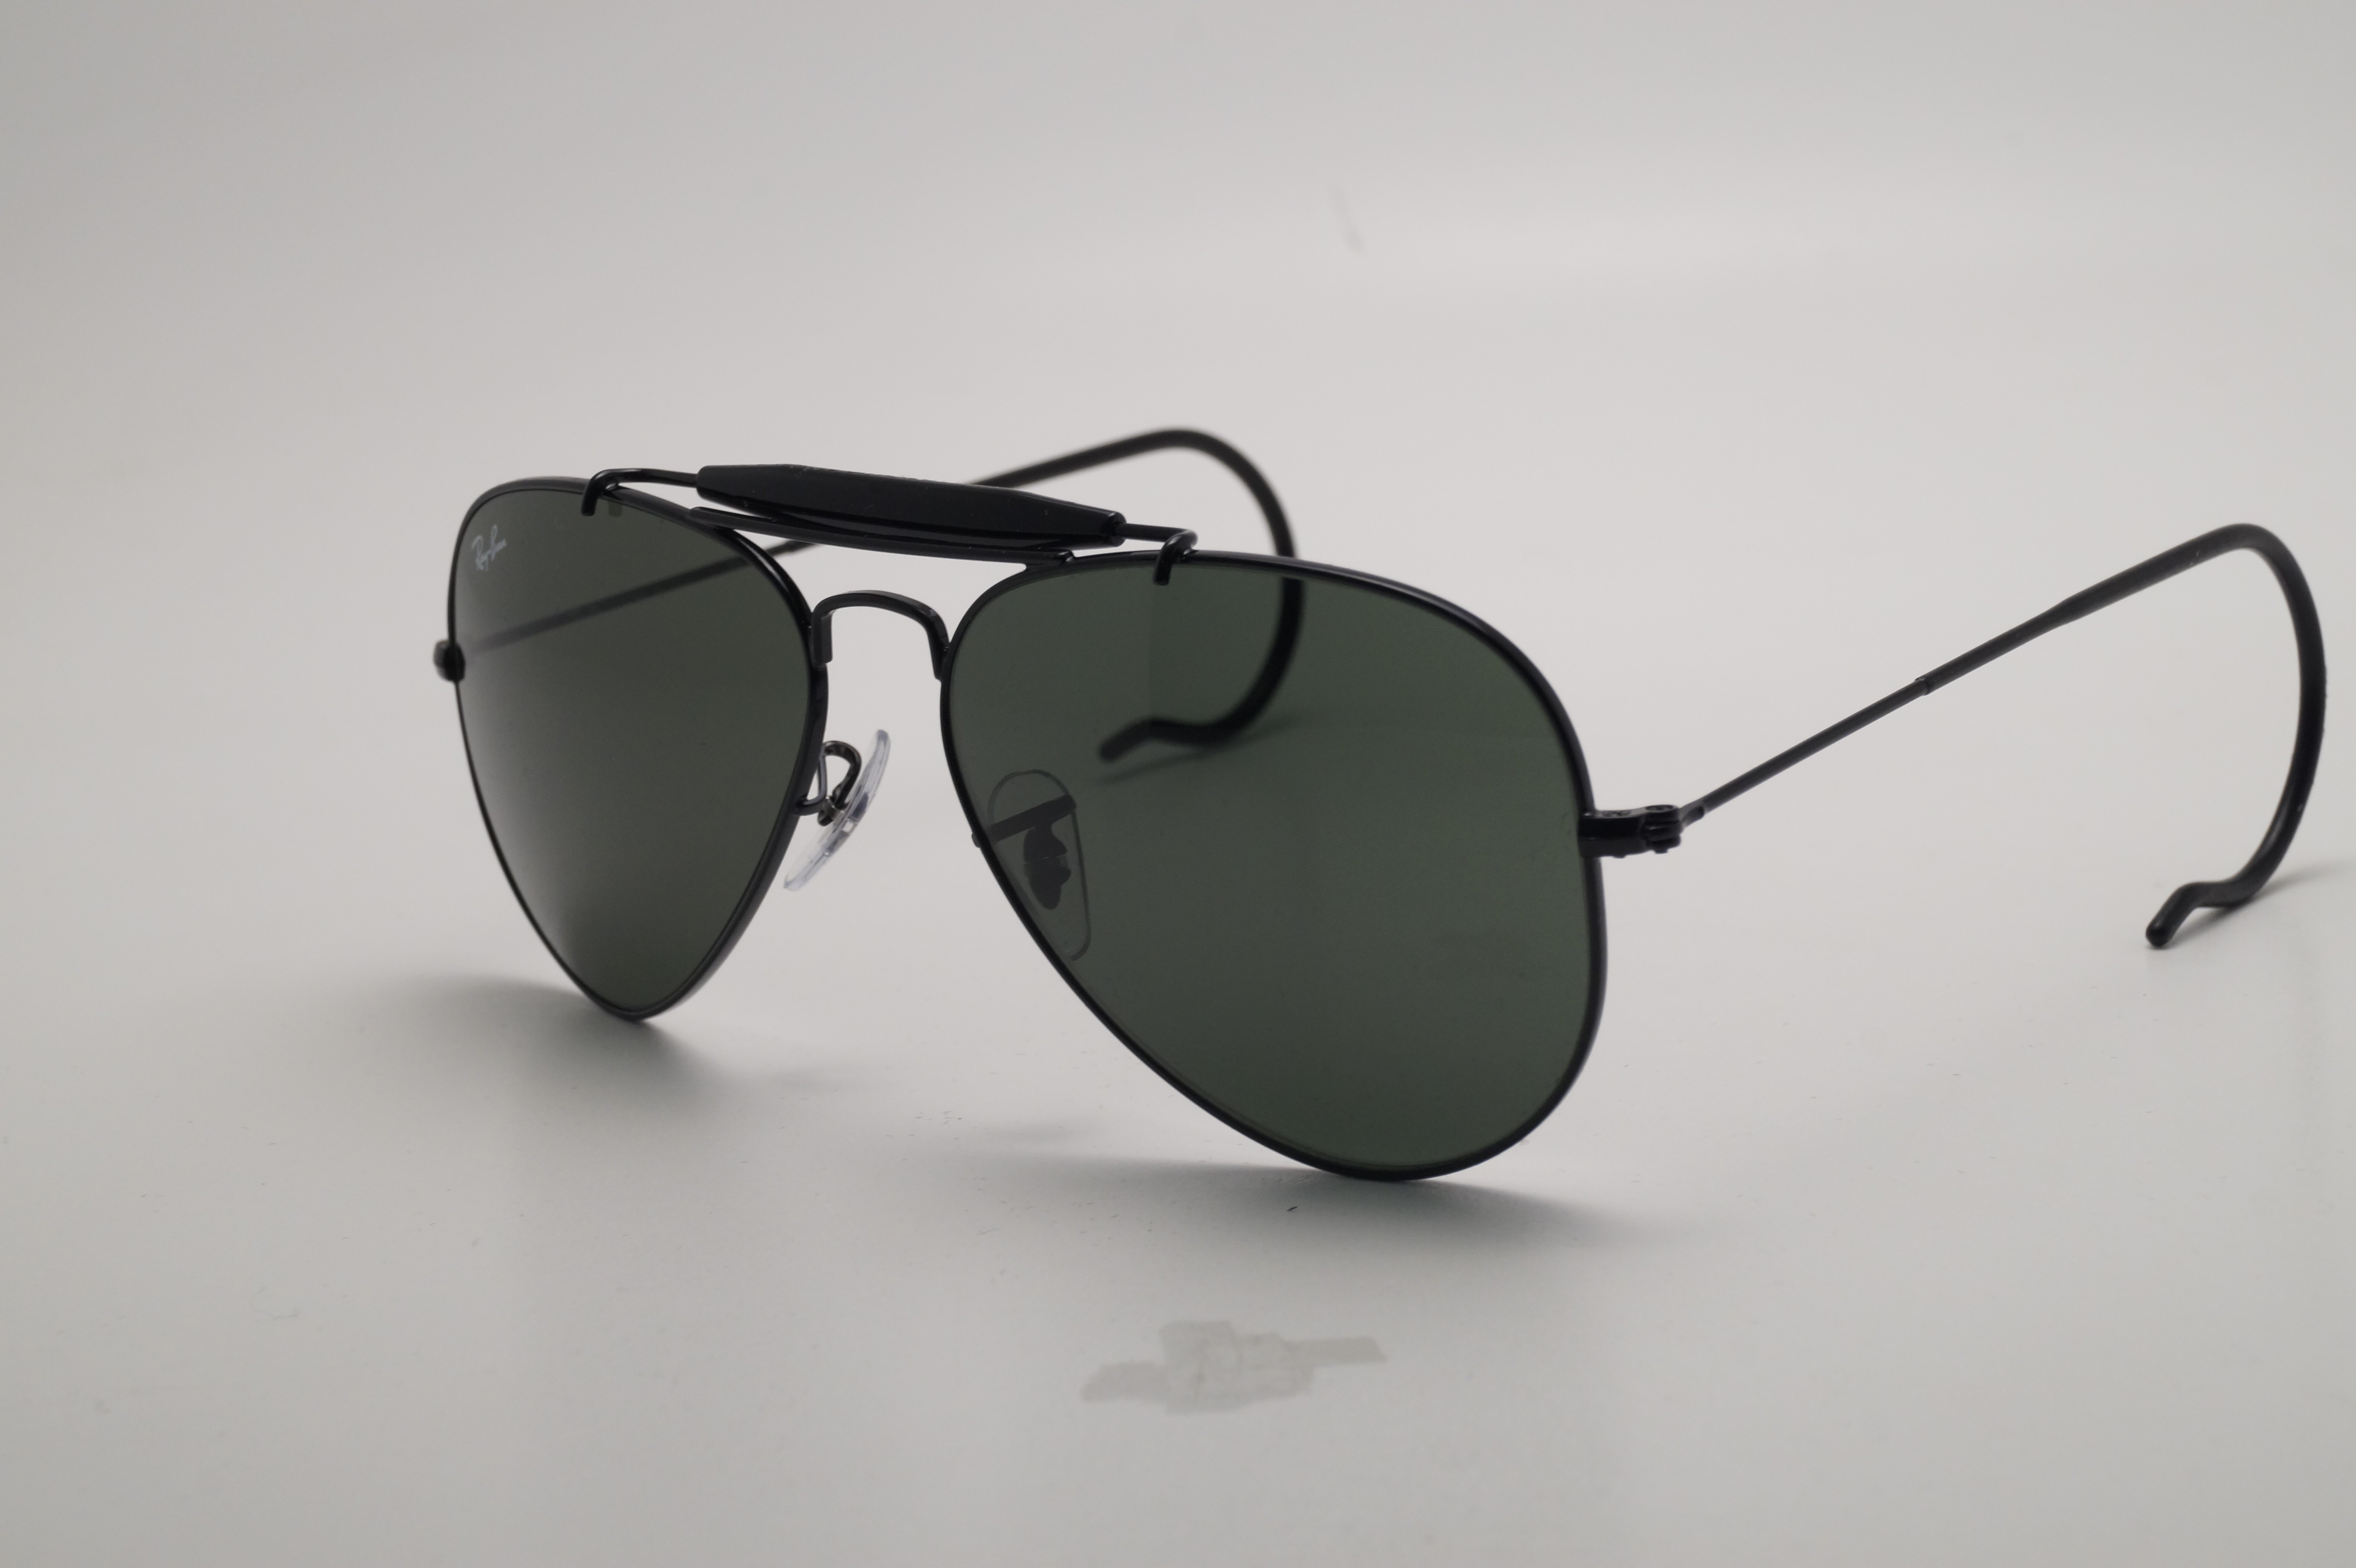 Ray Ban Outdoorsman Black G 15 Rb3030 L9500 58 14 Large